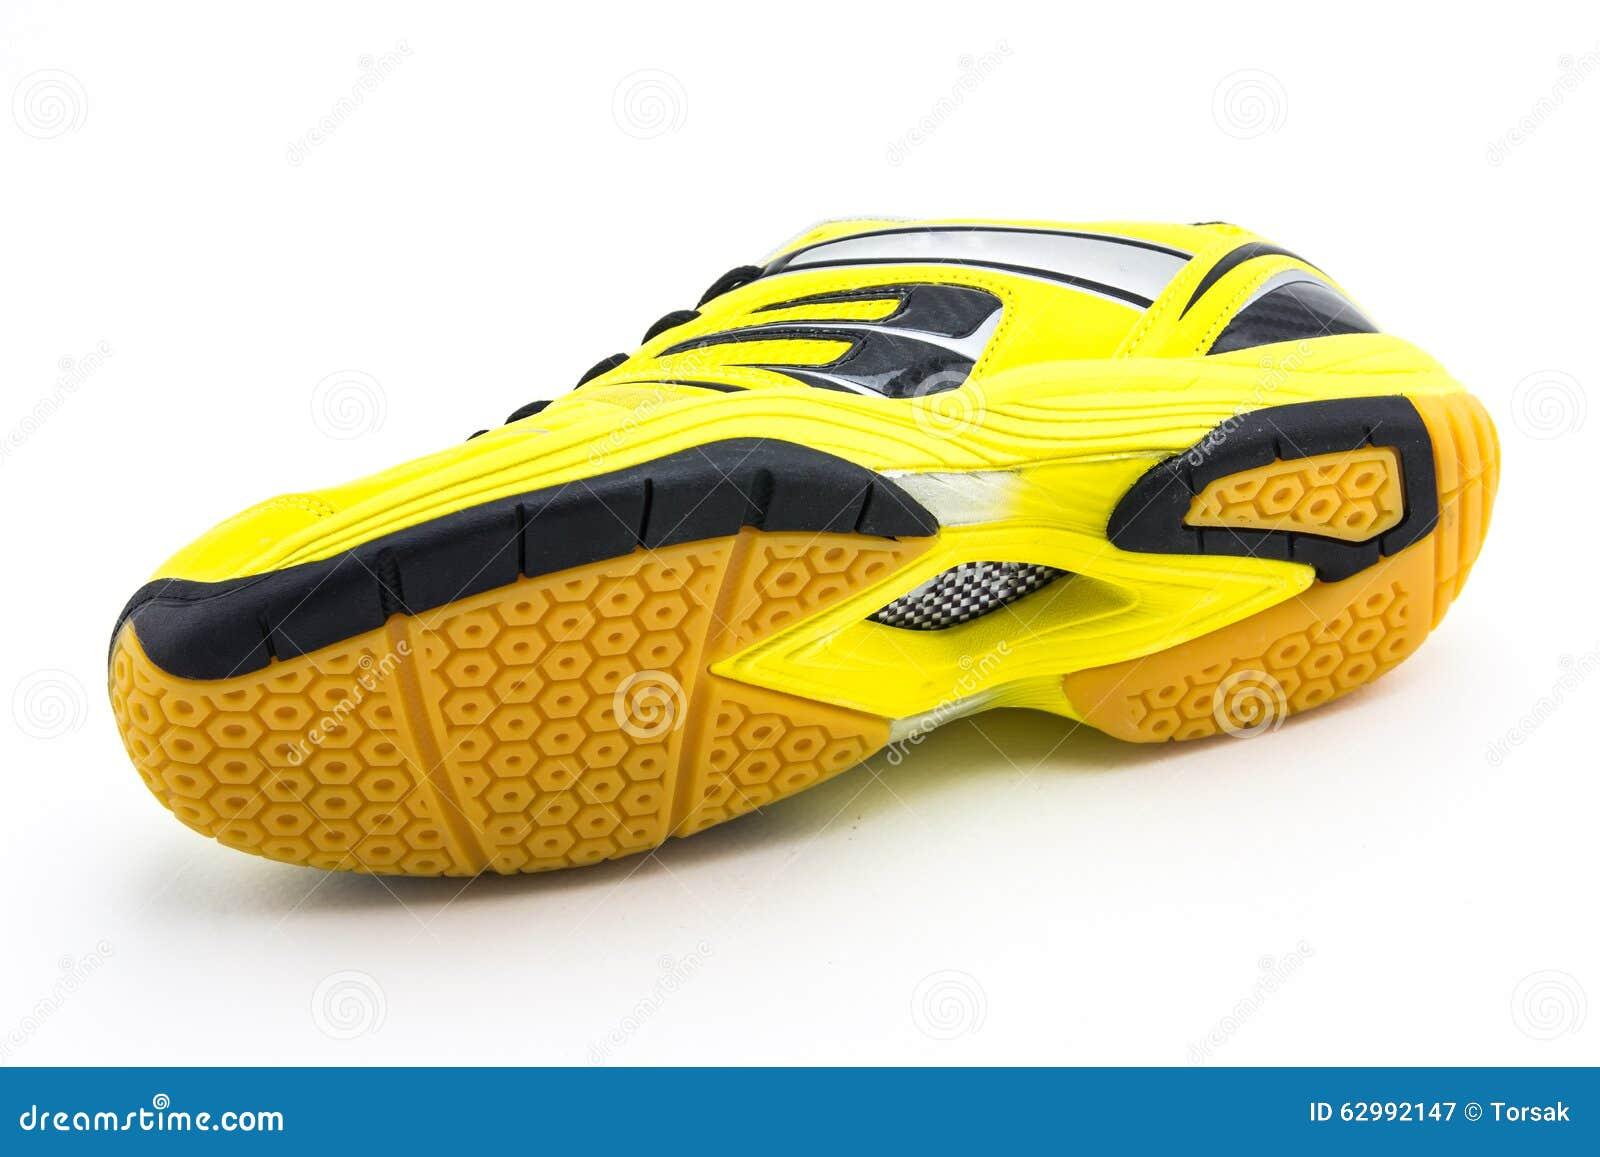 f67d377b01c Κίτρινα αθλητικά παπούτσια στοκ εικόνα. εικόνα από αθλητικό - 62992147